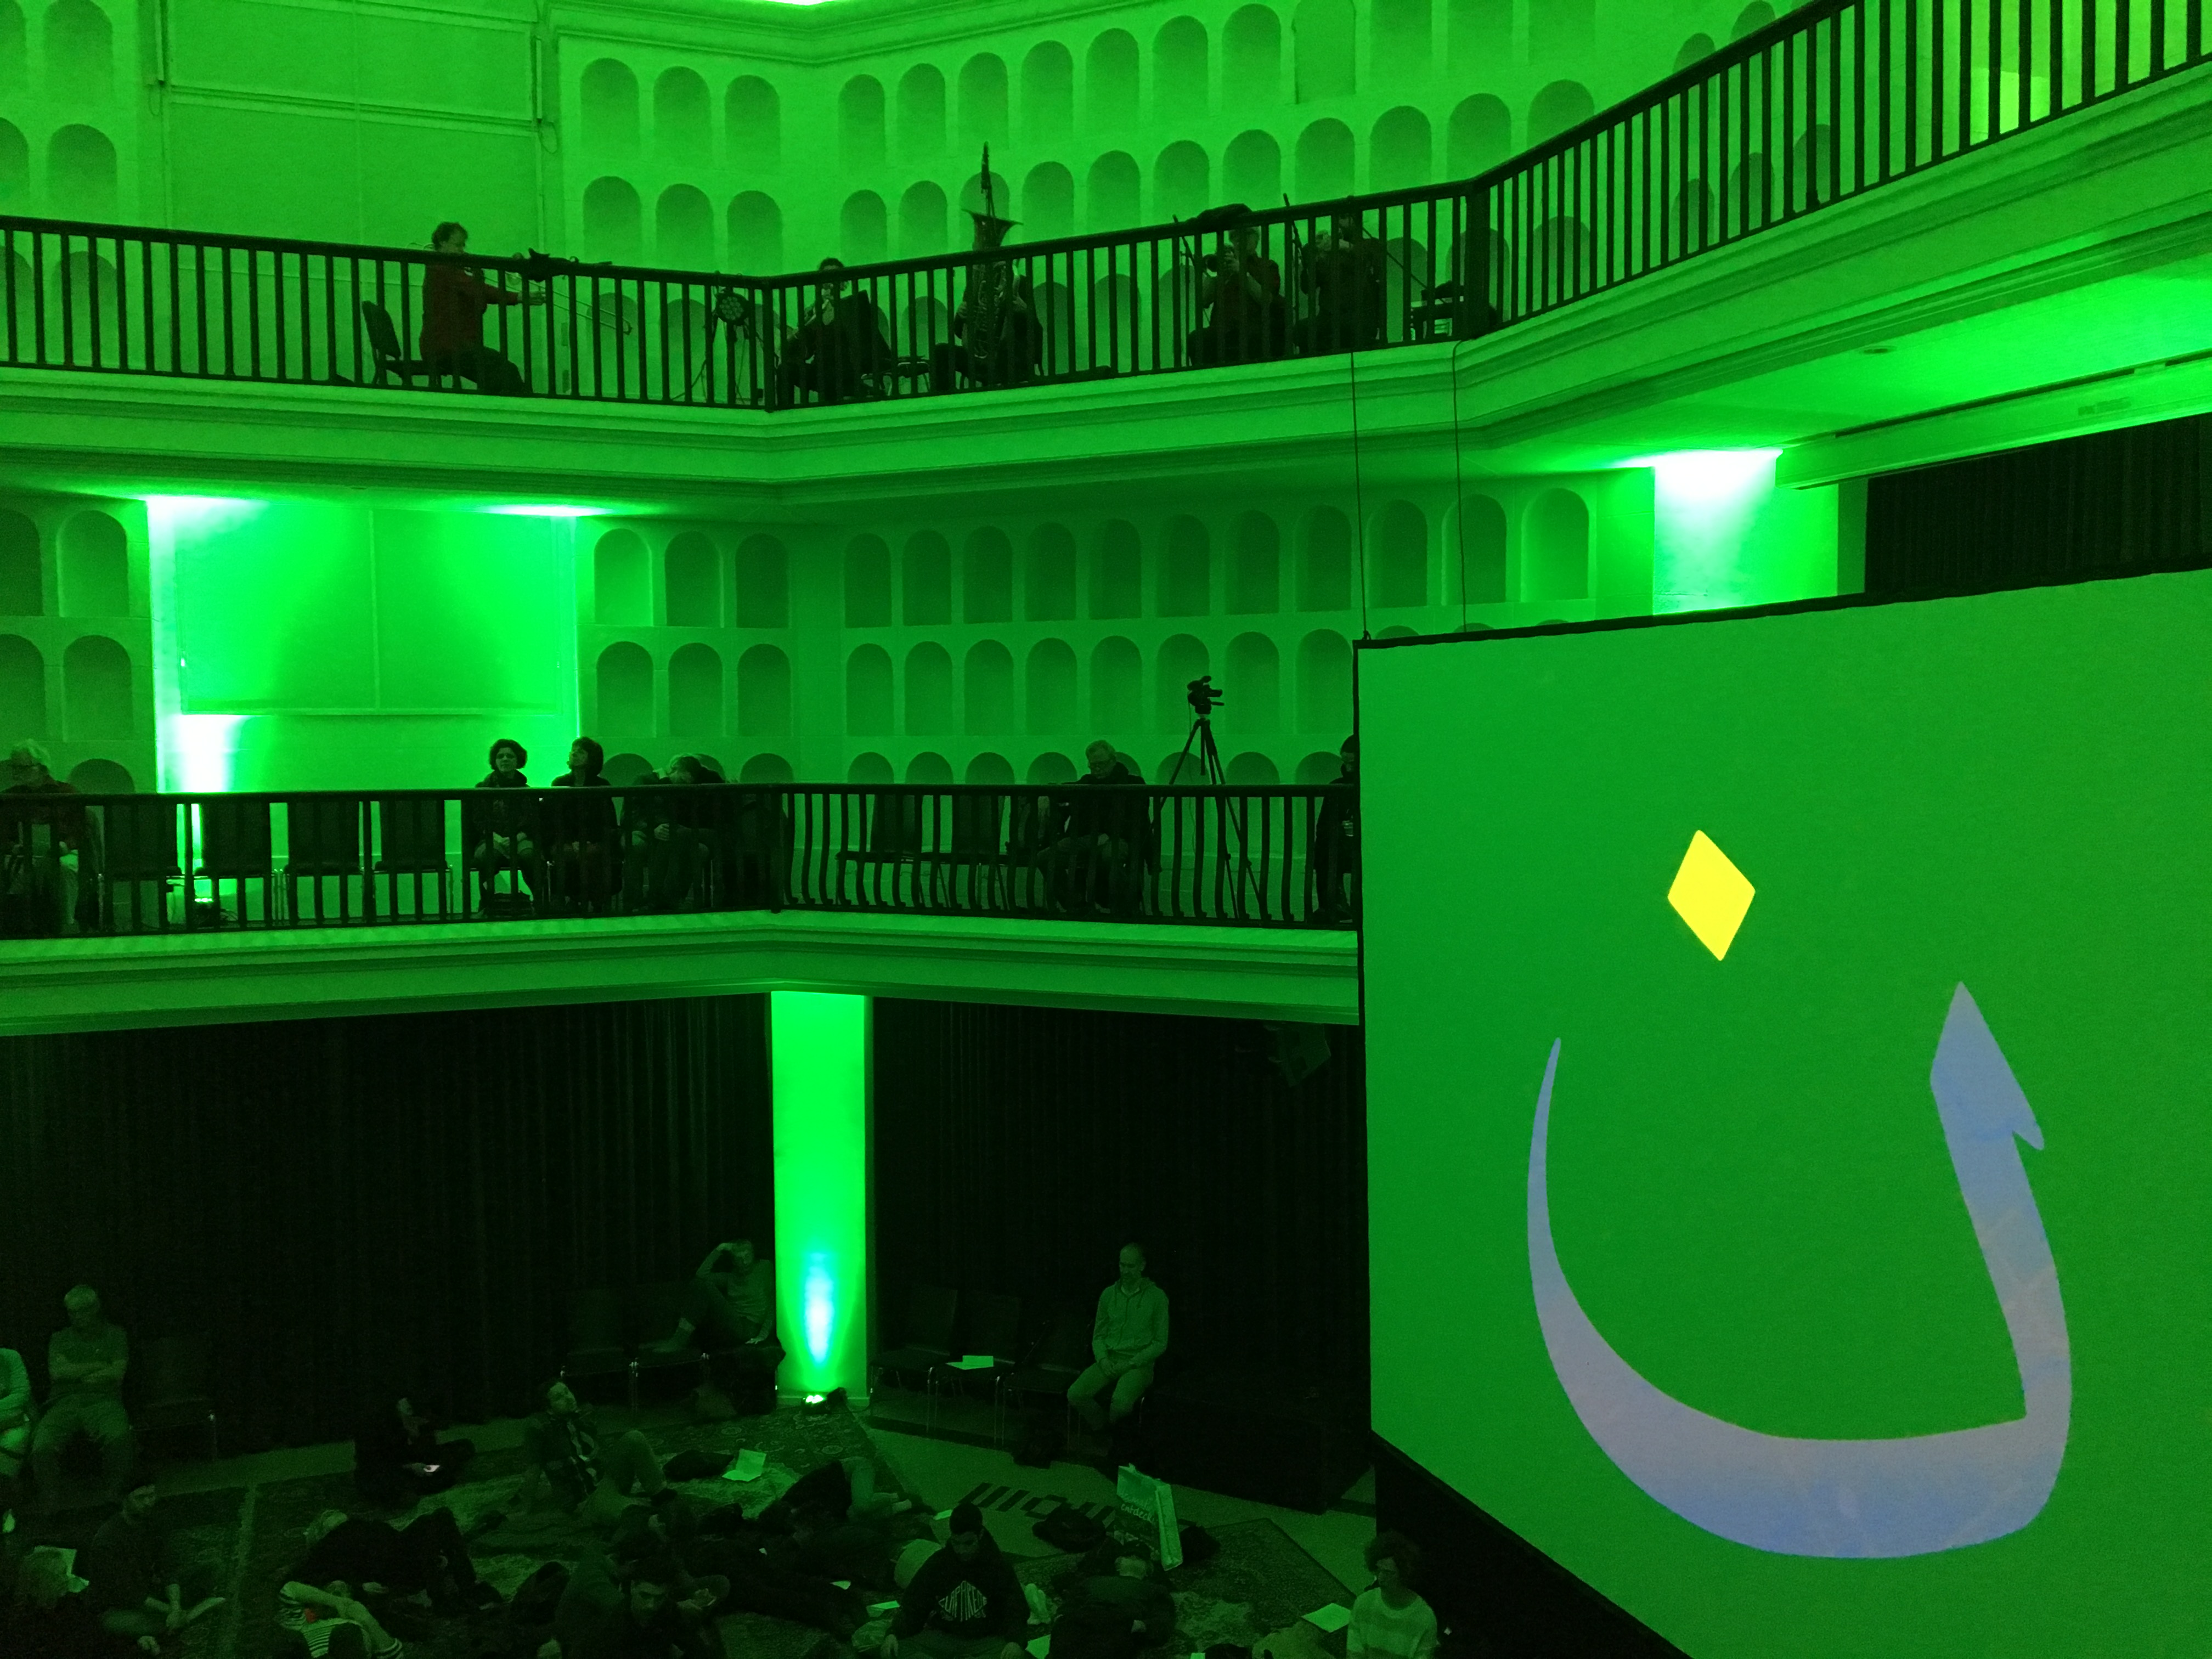 CCH Silent Green 1